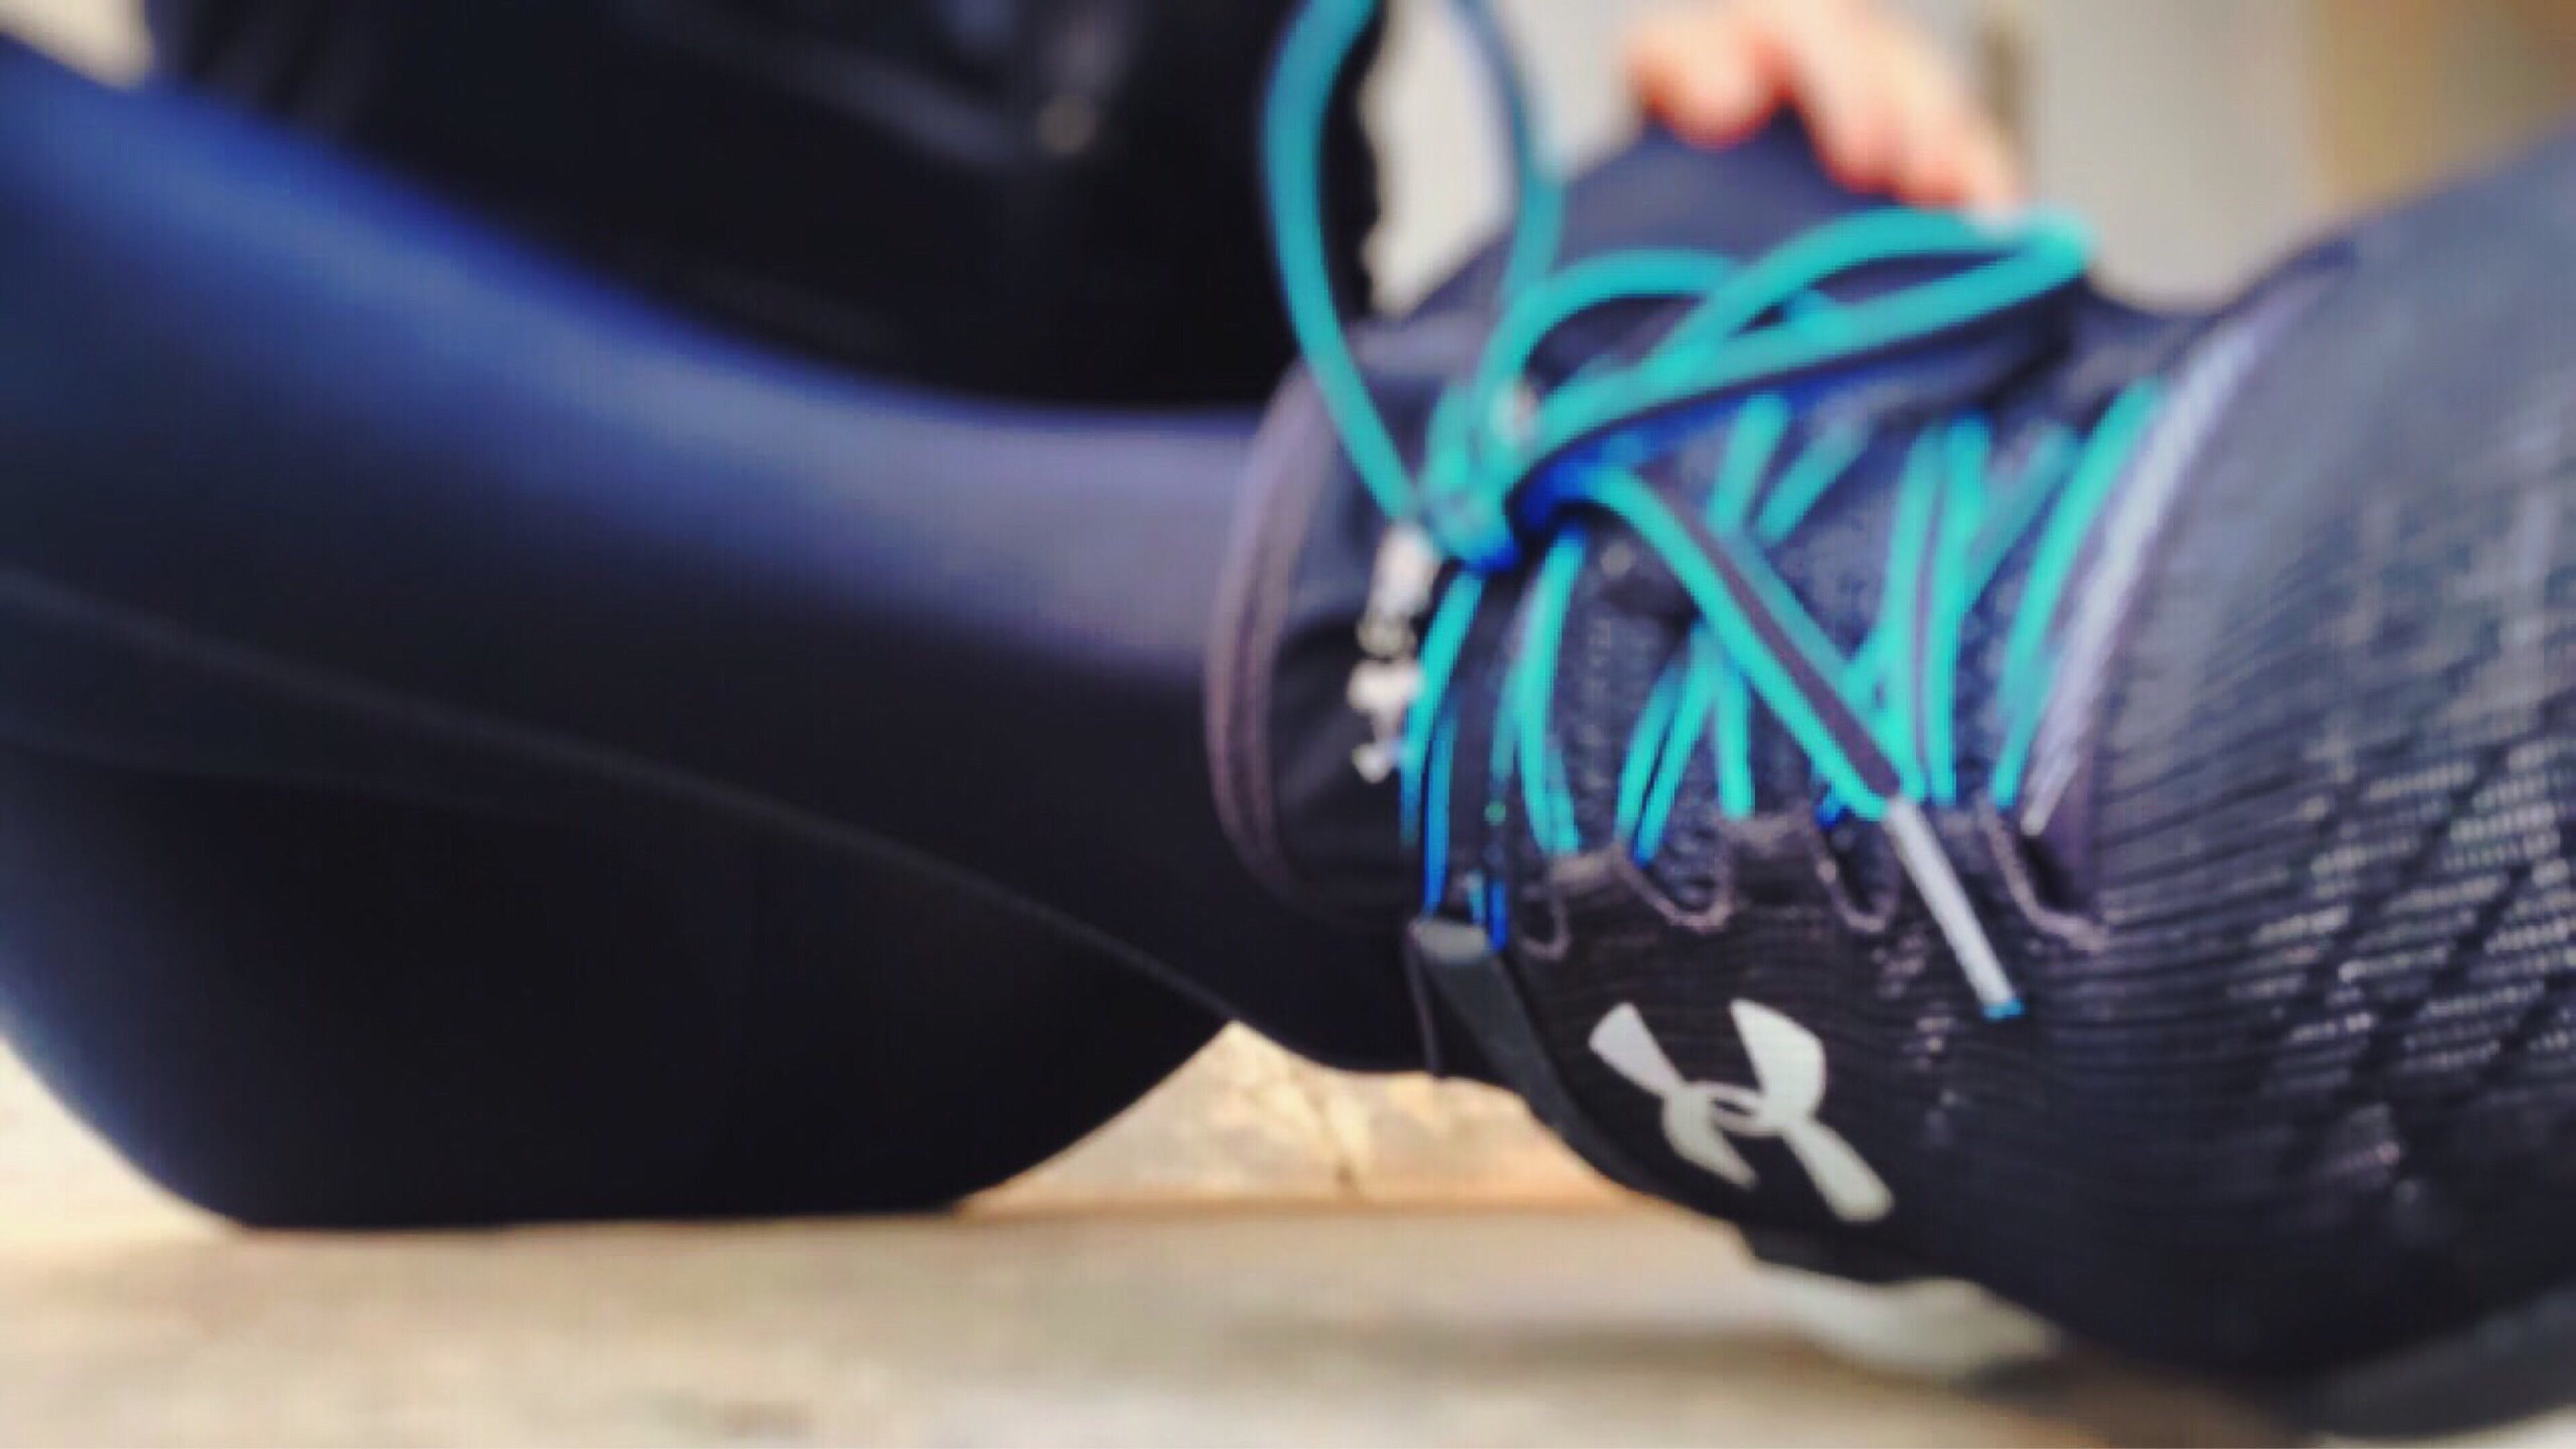 action, athlete, blur